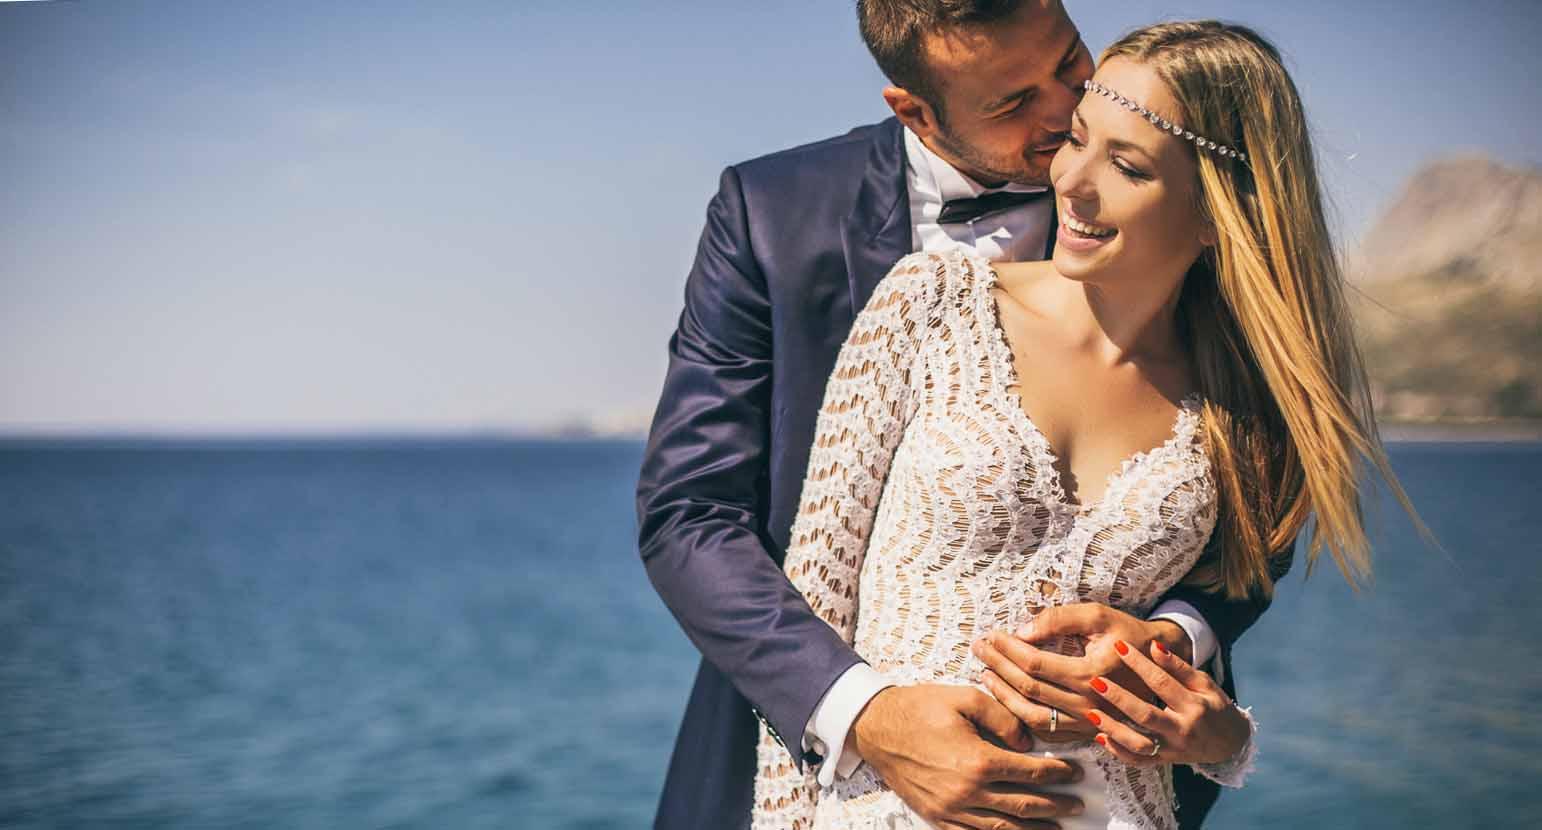 hochzeit in kroatien dank wedding planner milan interview. Black Bedroom Furniture Sets. Home Design Ideas